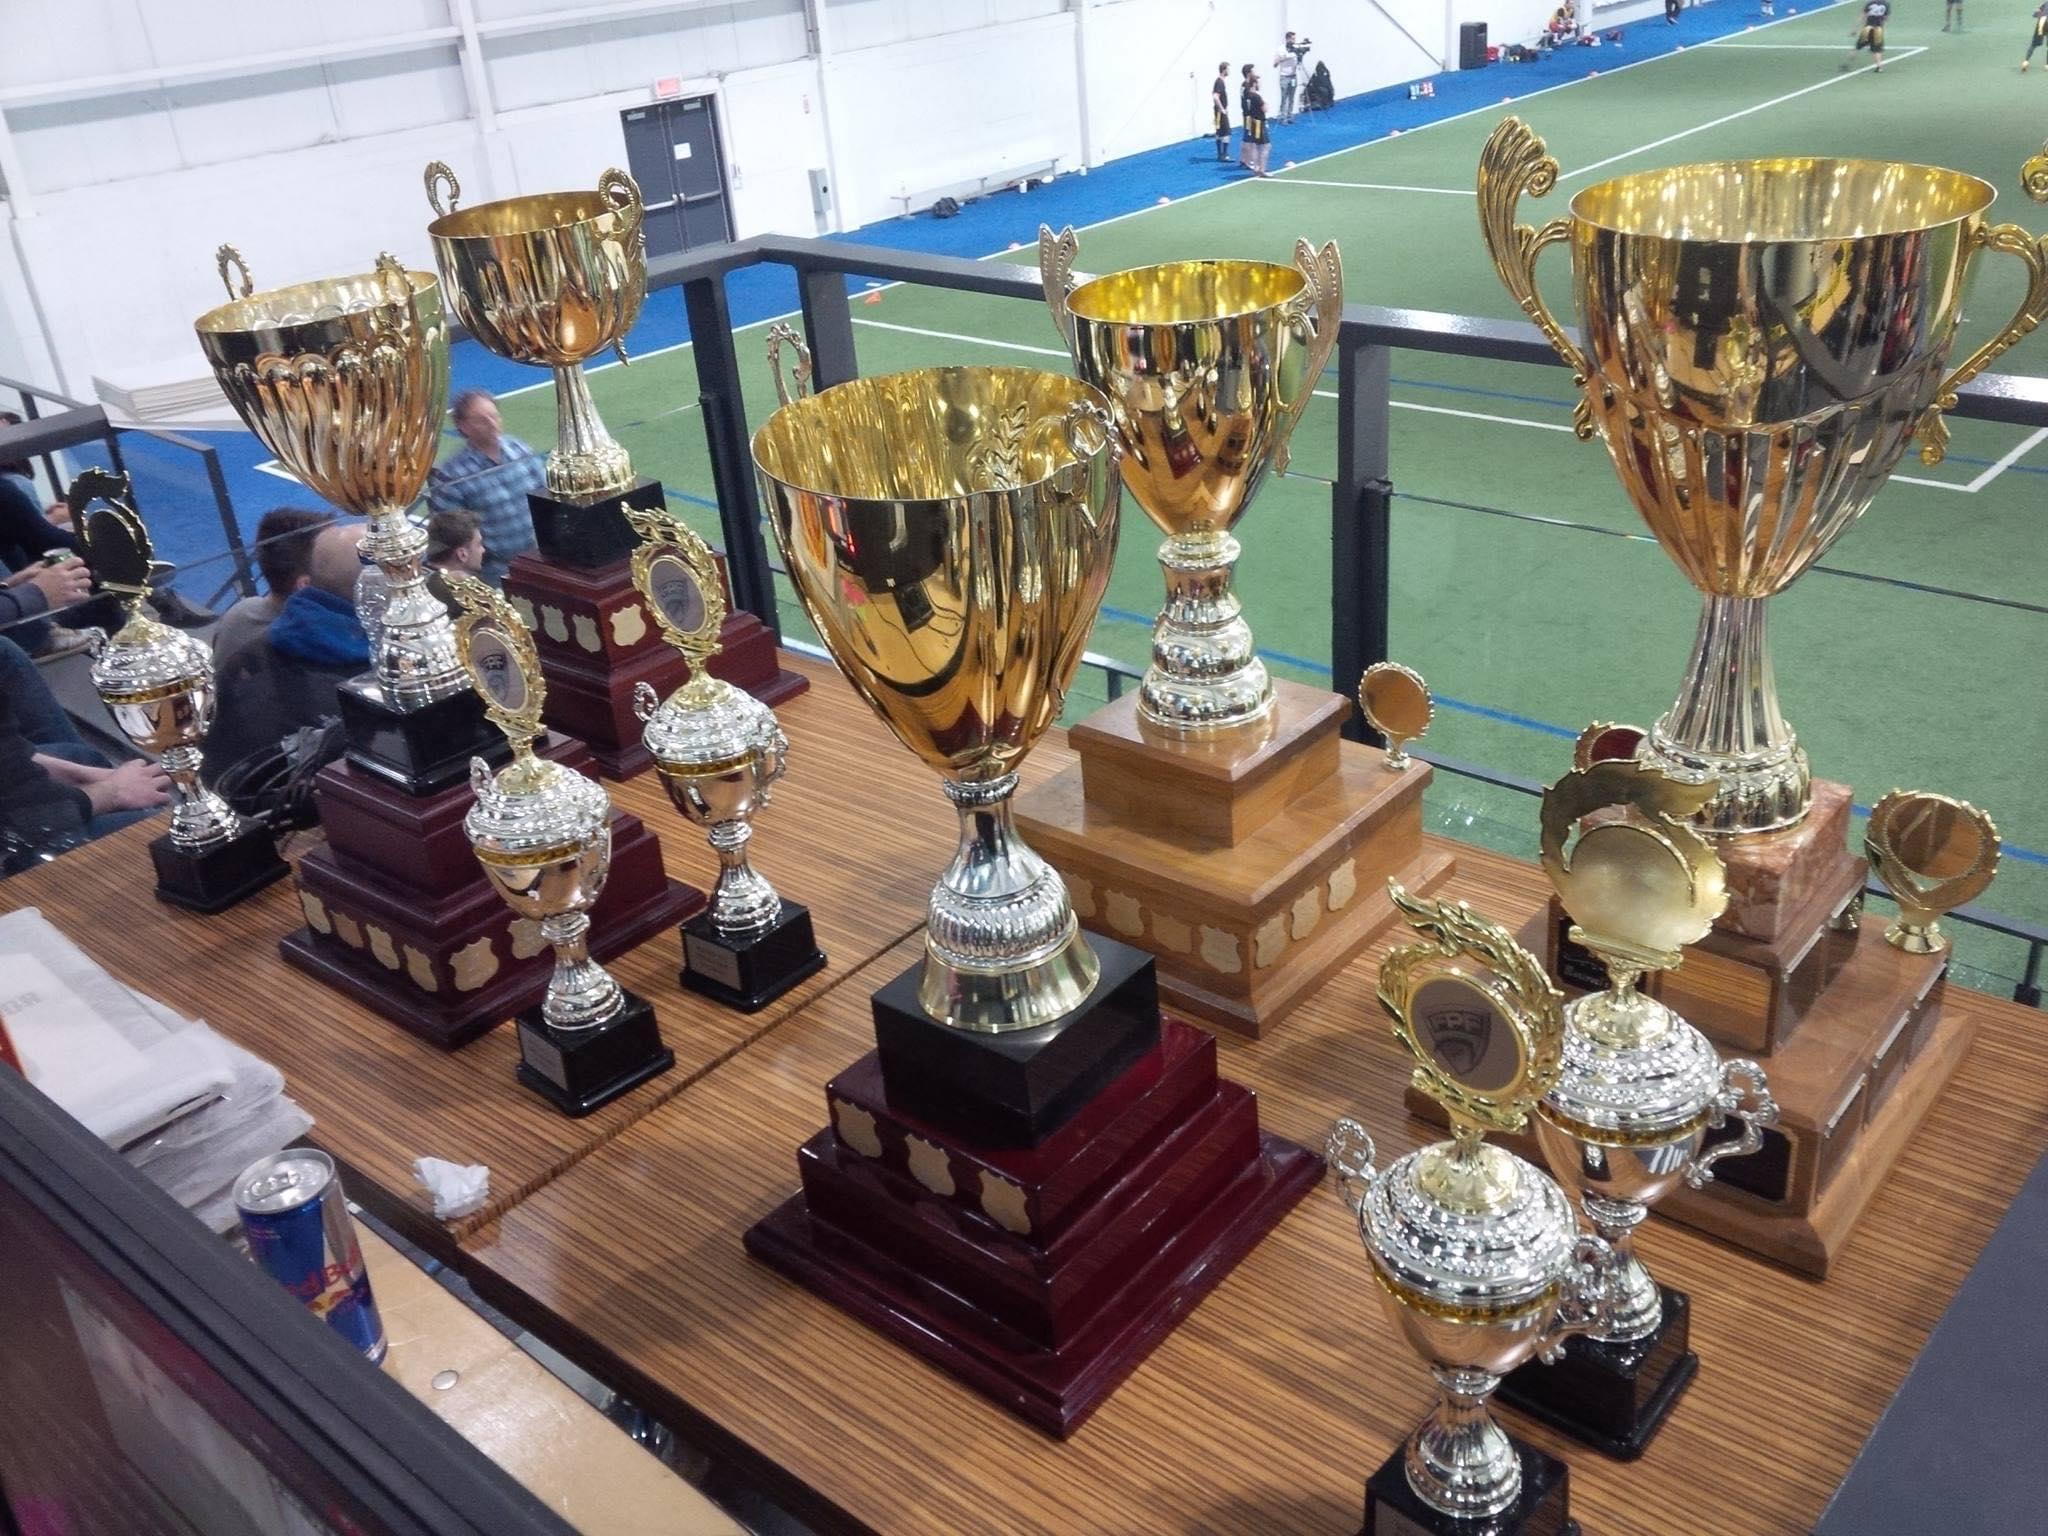 FPF CUP 2020 AWARD WINNERS